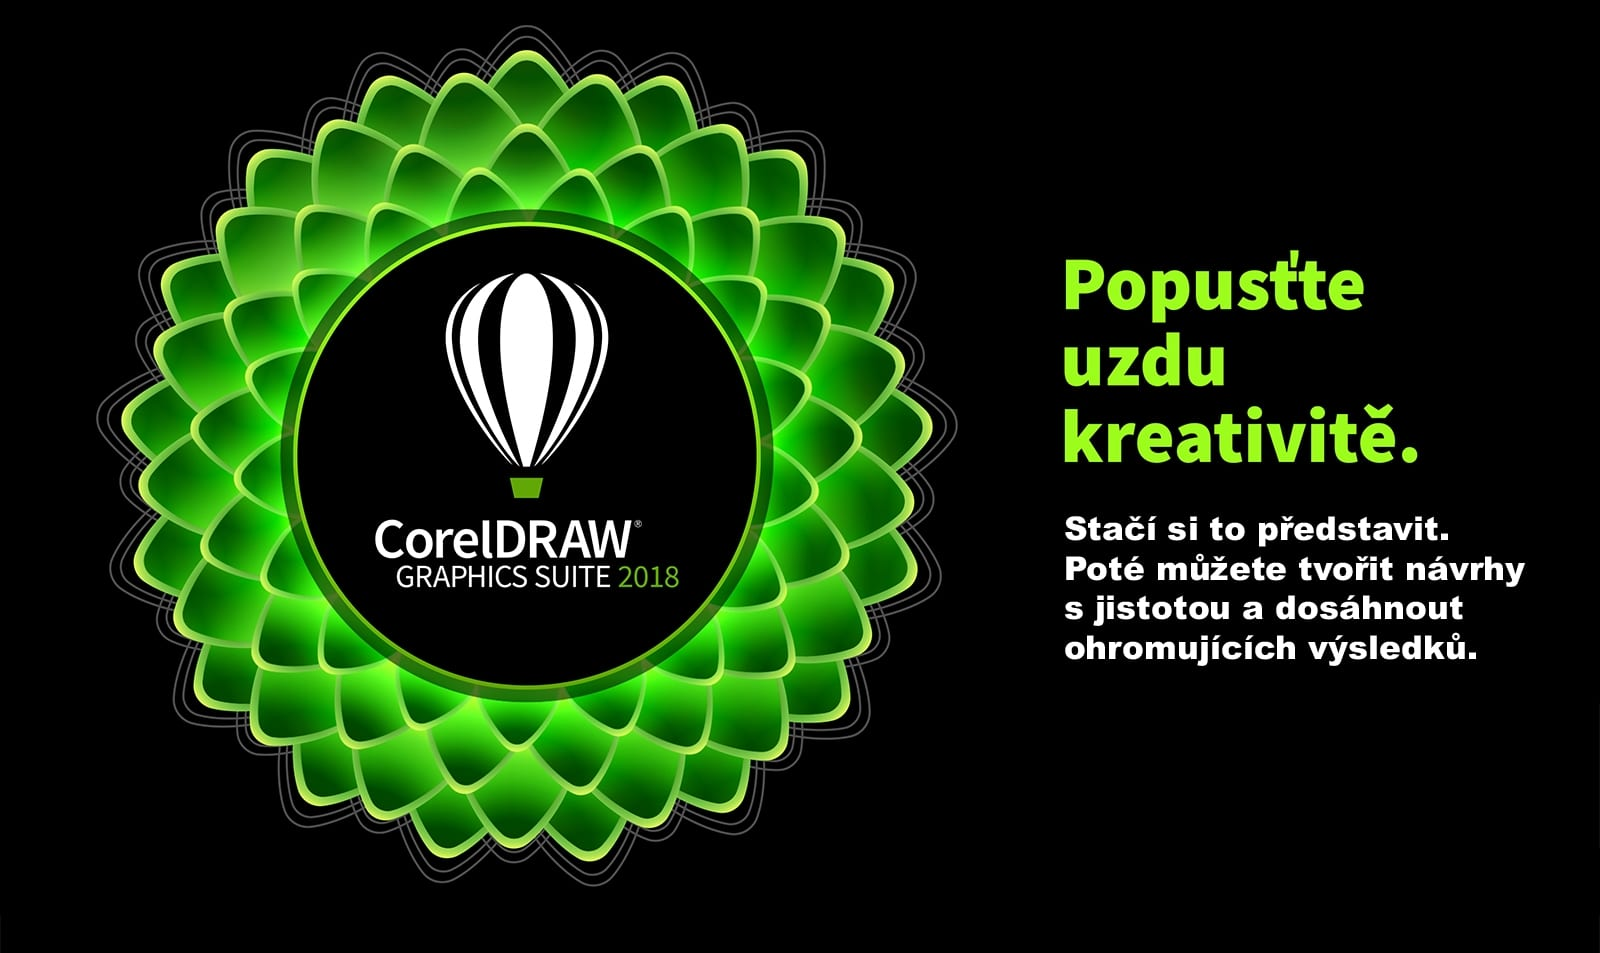 CorelDRAW Graphics Suite 2018 Flyer CZ 1 - Nová verze CorelDRAW Graphics Suite 2018